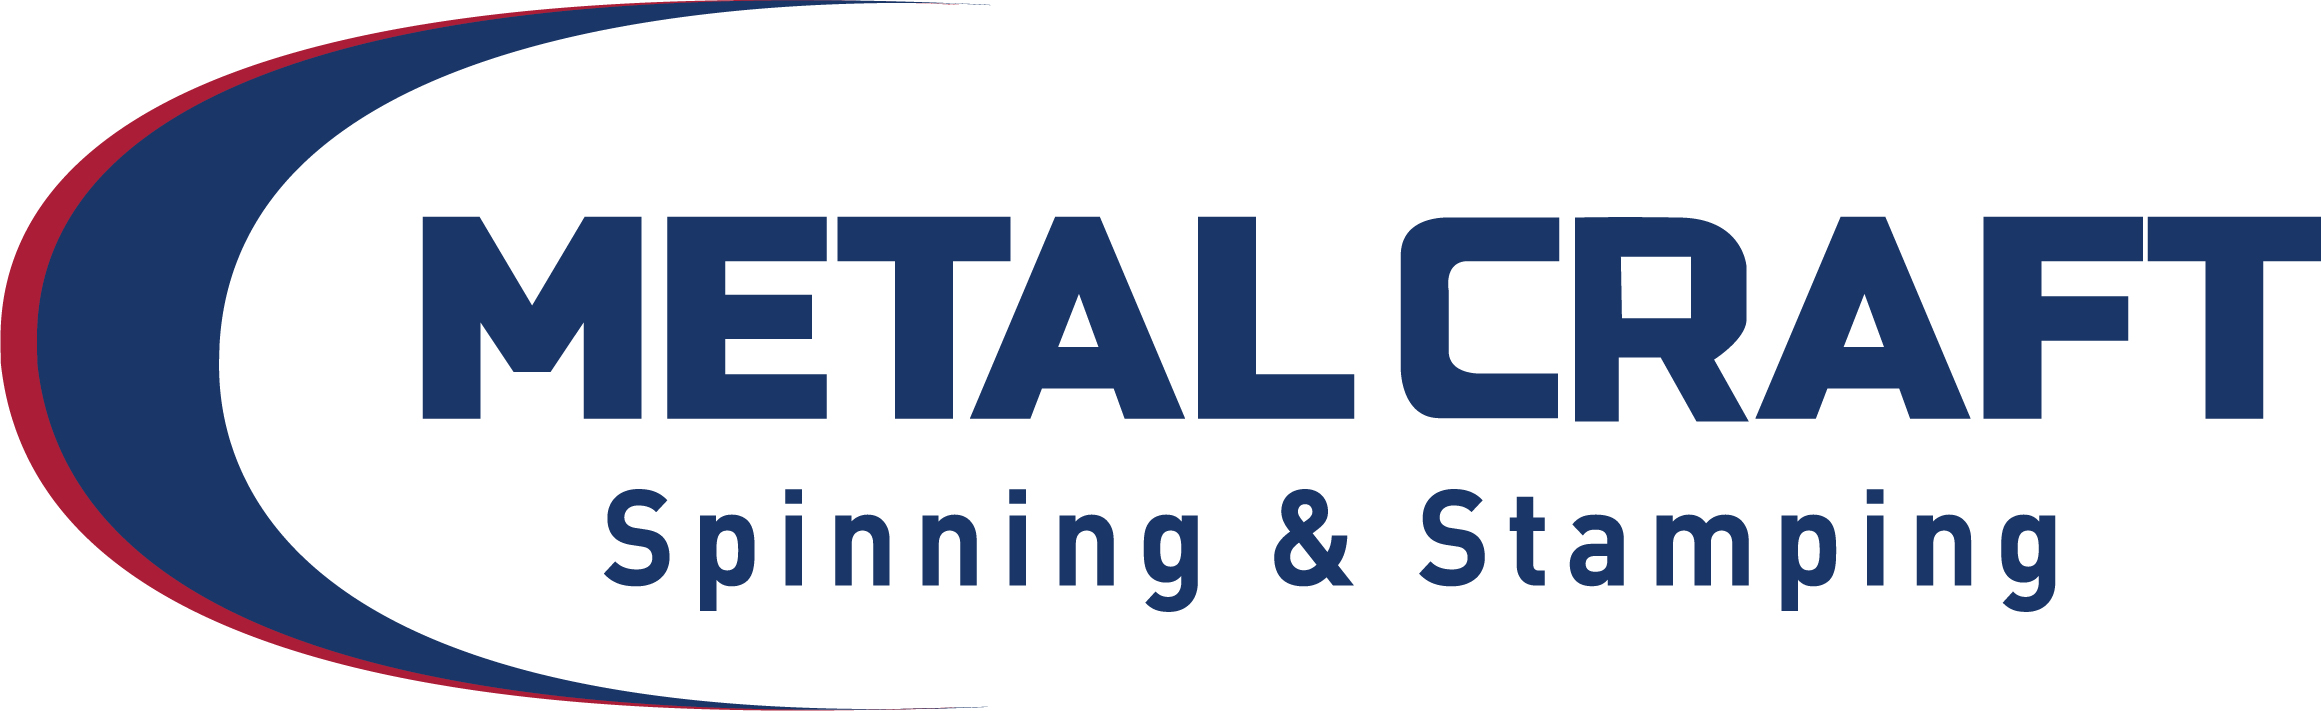 SILVER SPONSOR - Metalcraft Spinning - Logo